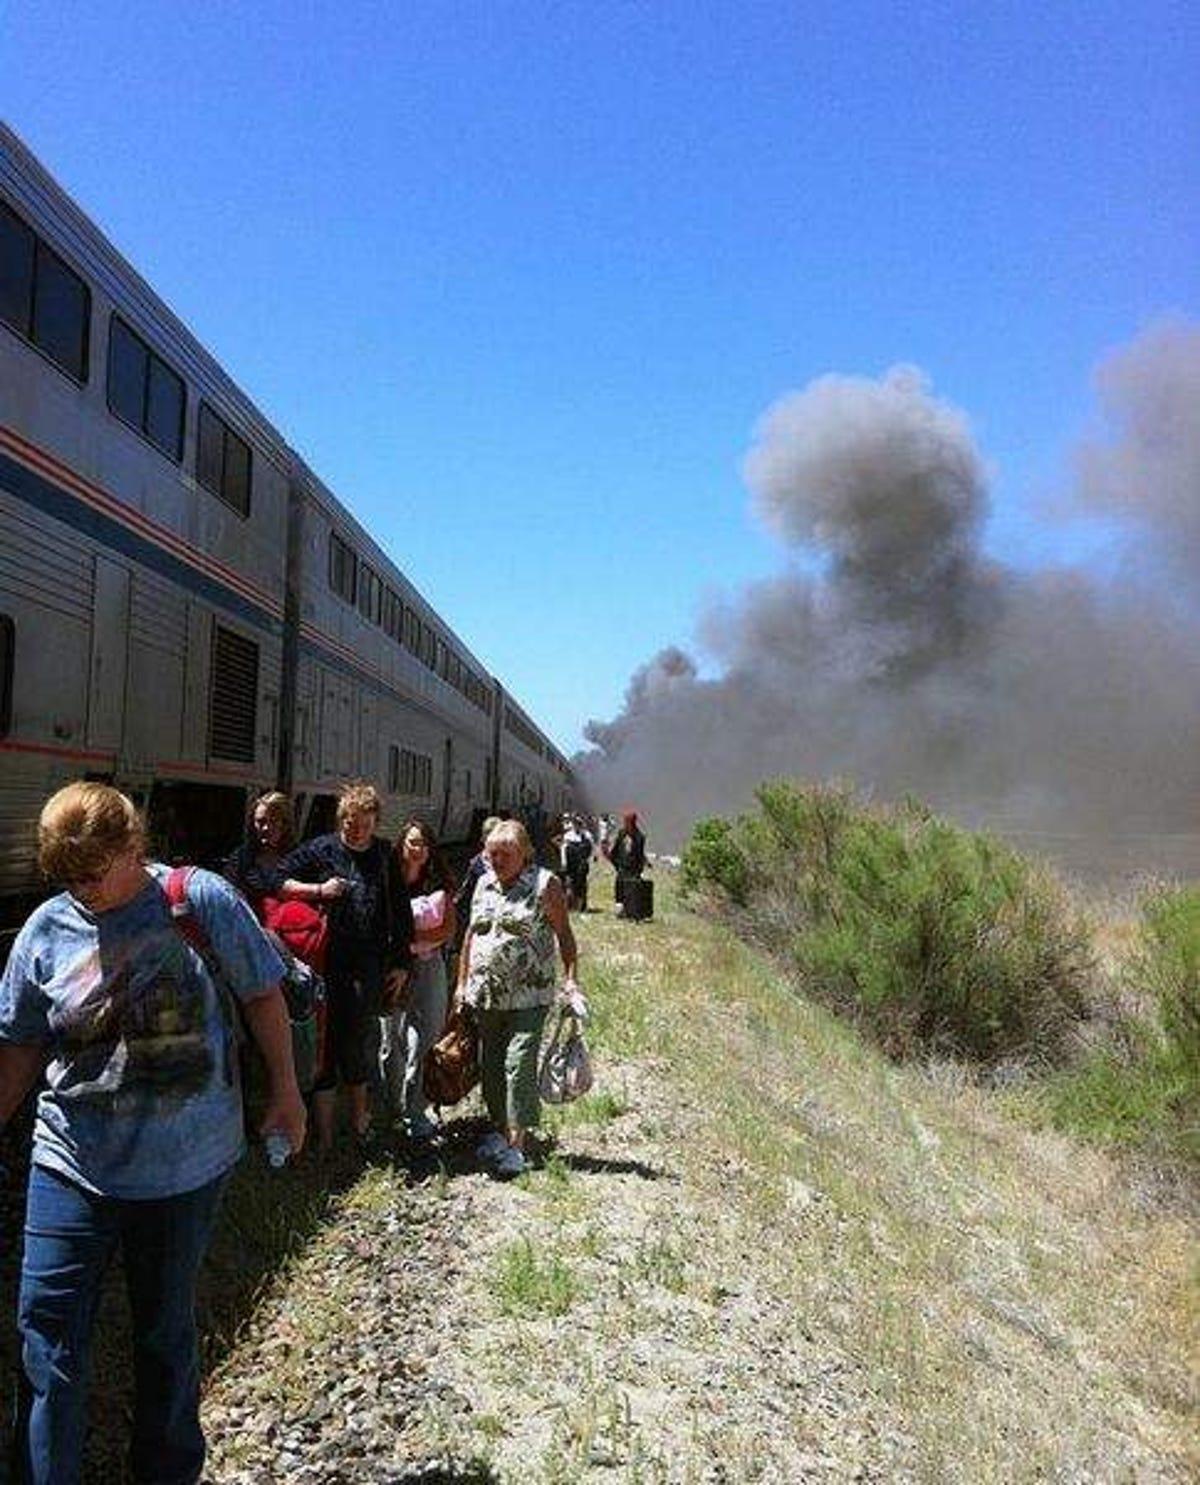 Amtrak train crash: 6 confirmed dead